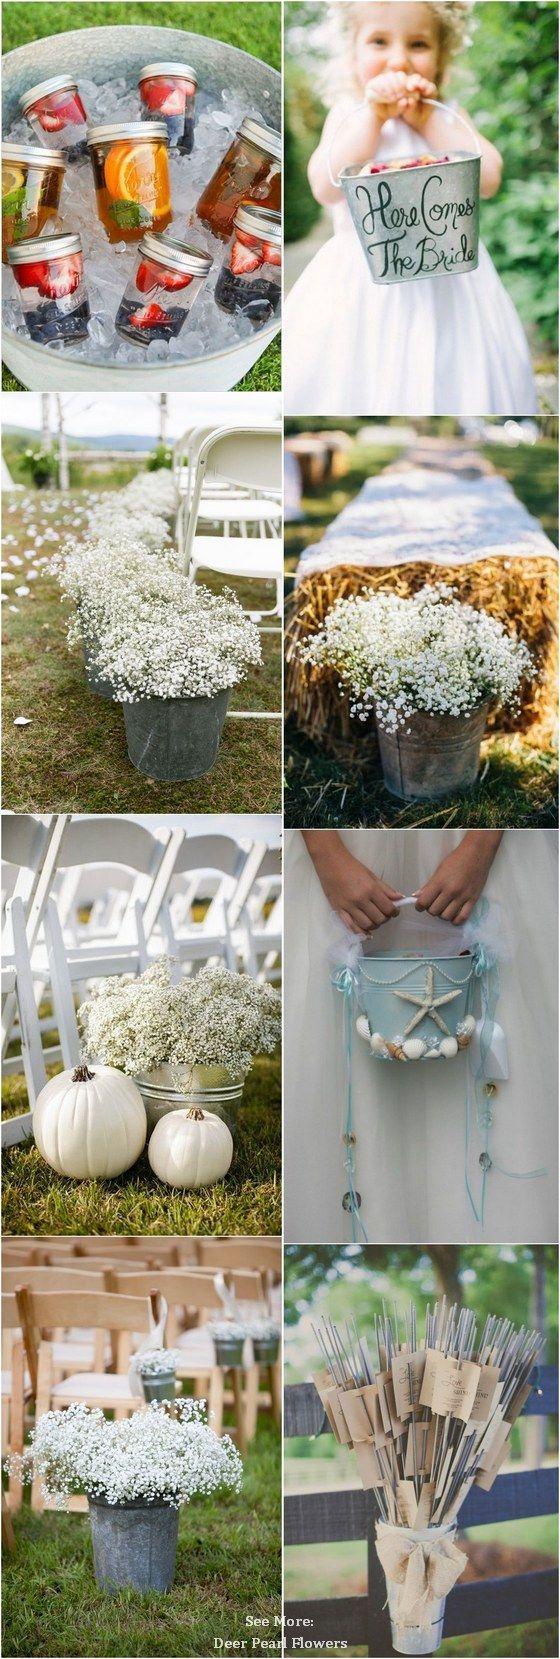 best 25 lemonade wedding ideas on pinterest wedding decorations